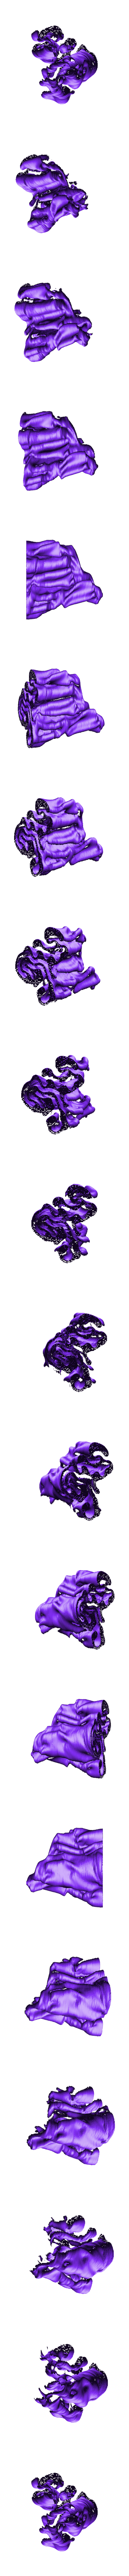 gro2.stl Download free STL file Weird terrain collection • 3D printer object, ferjerez3d